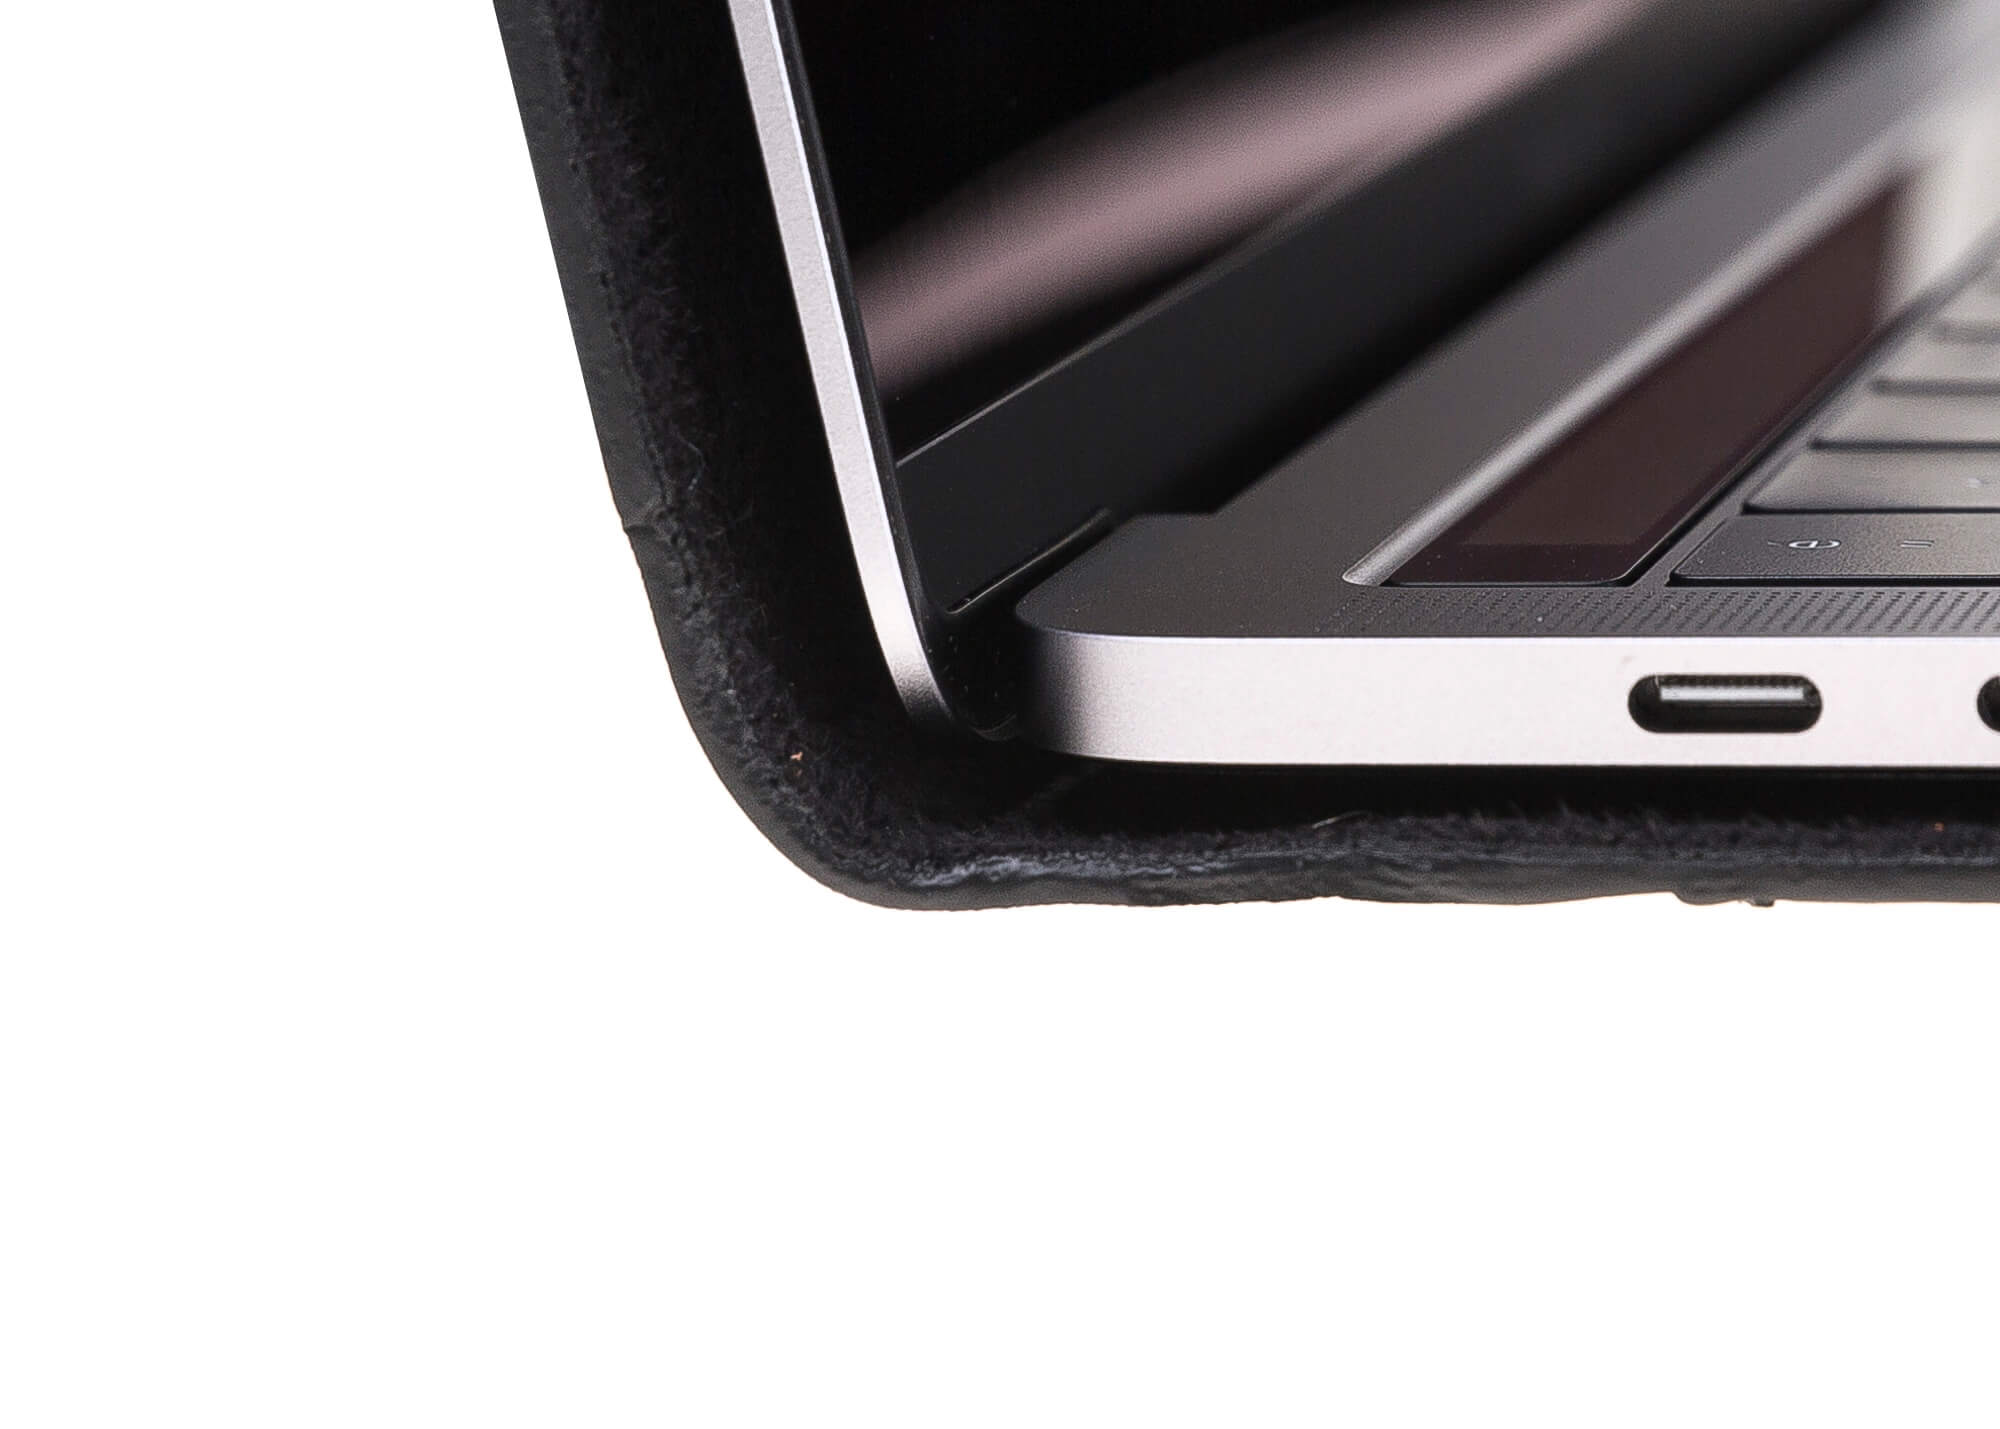 macbook pro 13 zoll retina 13 zoll m nich tasche aus. Black Bedroom Furniture Sets. Home Design Ideas